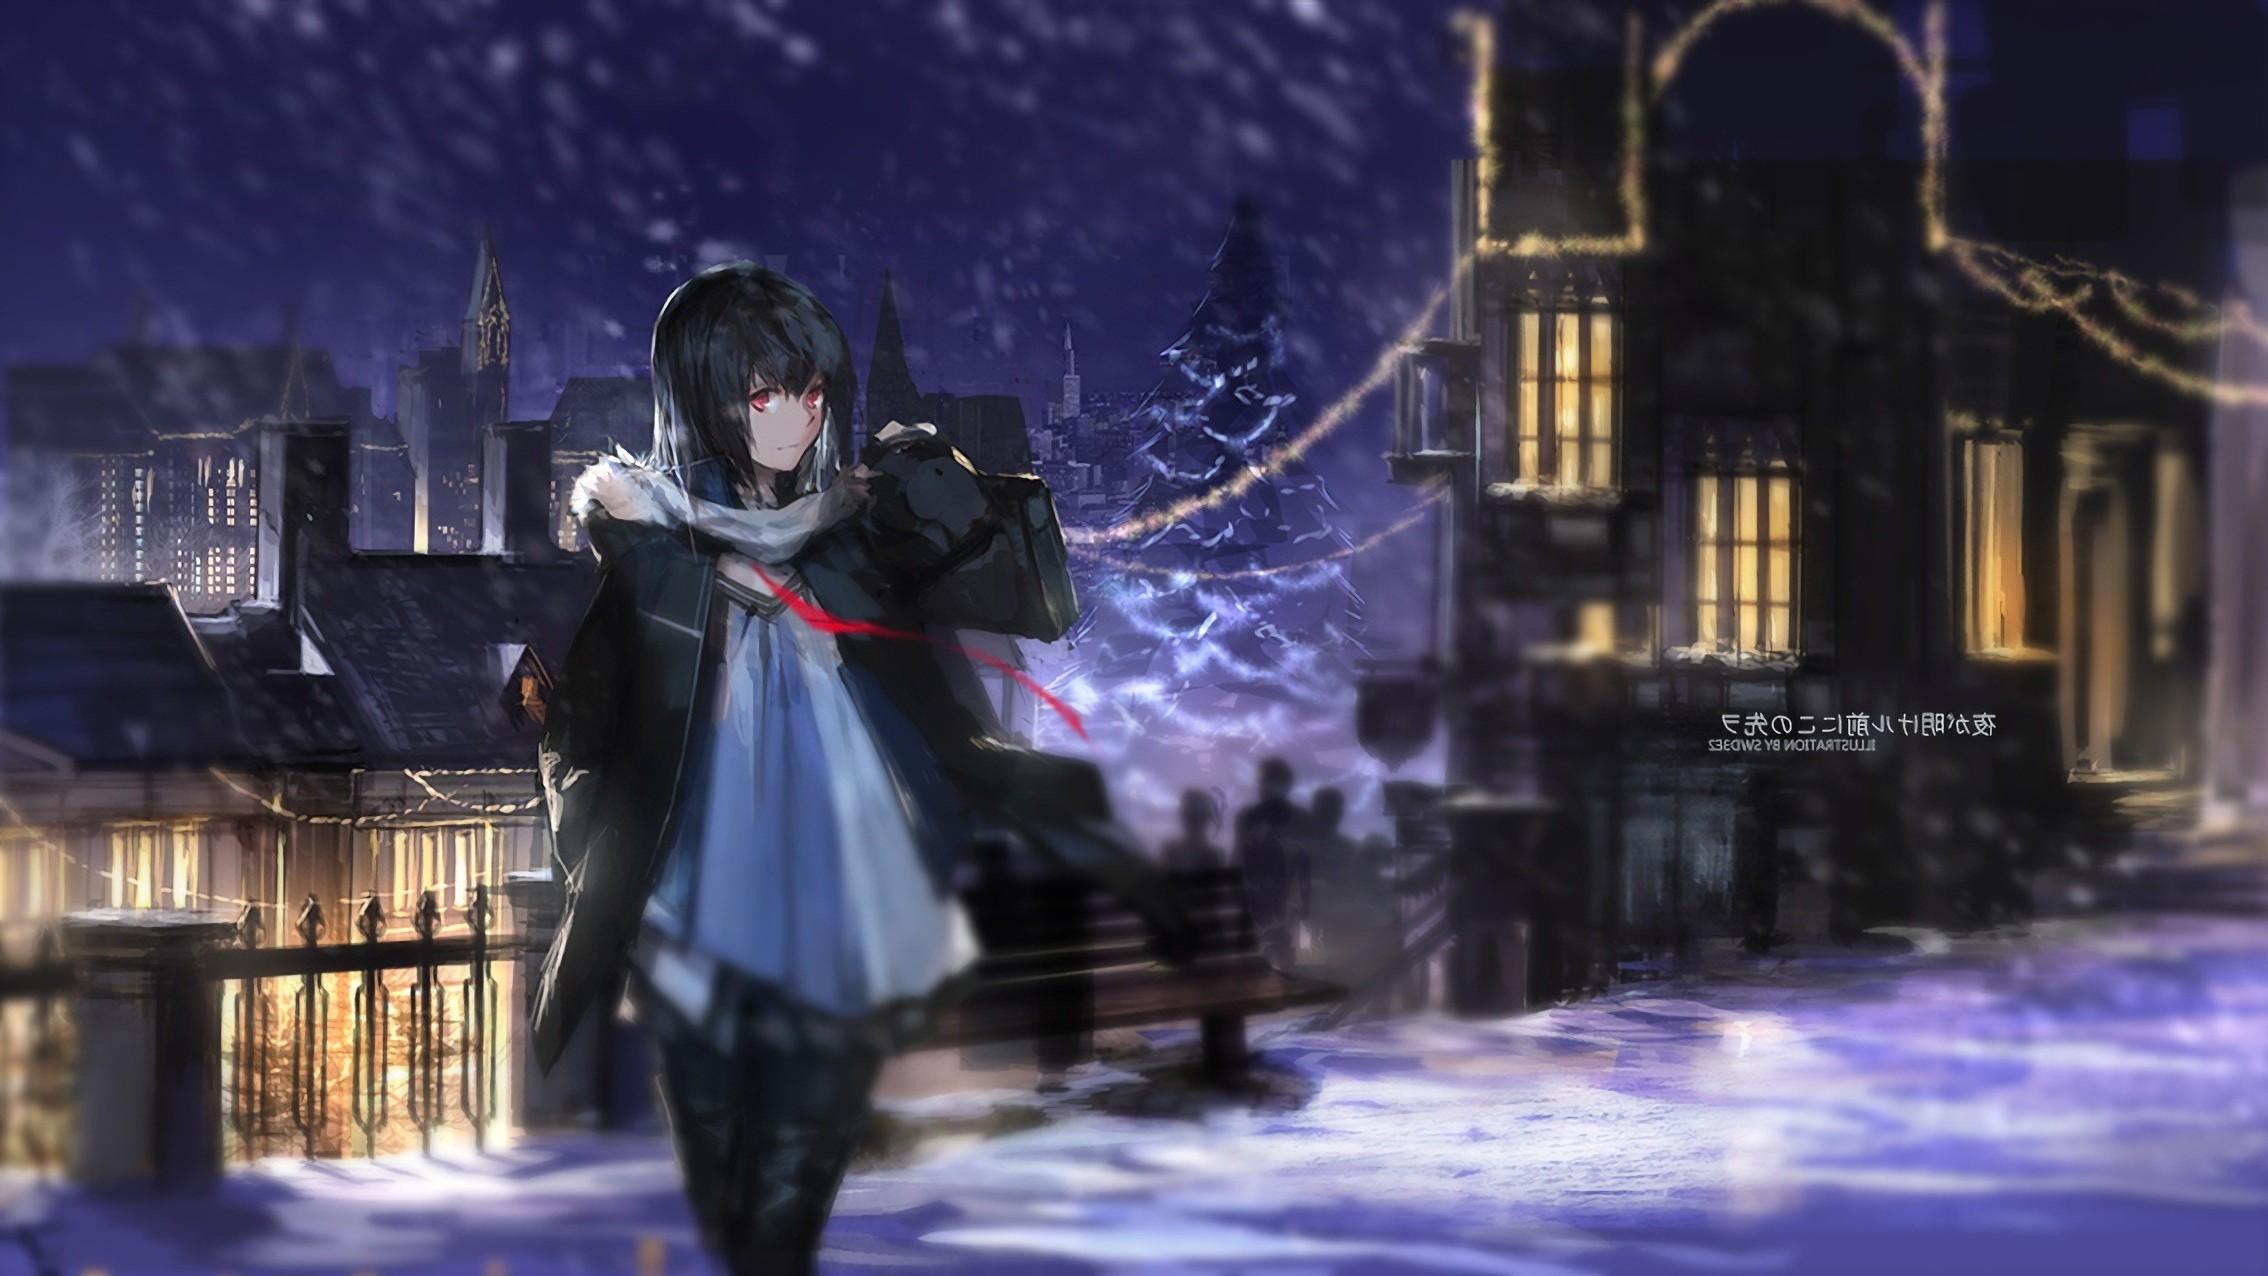 274 2744035 snowy christmas background anime